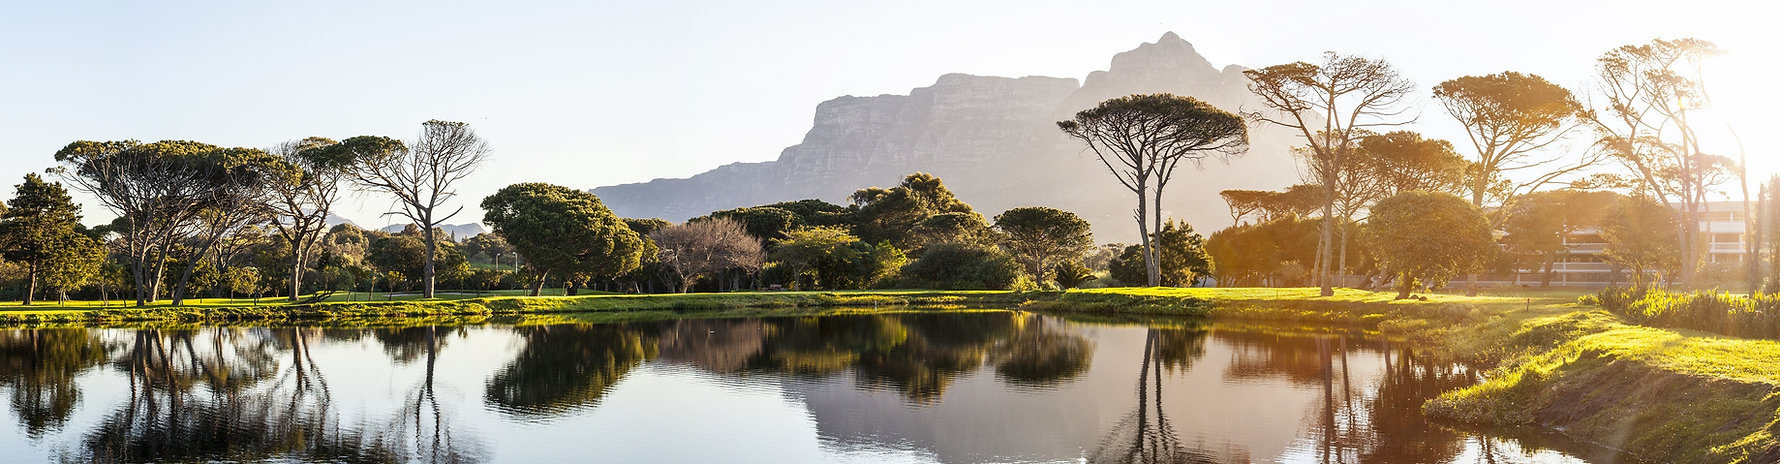 Still waters, lake, mountains, nature